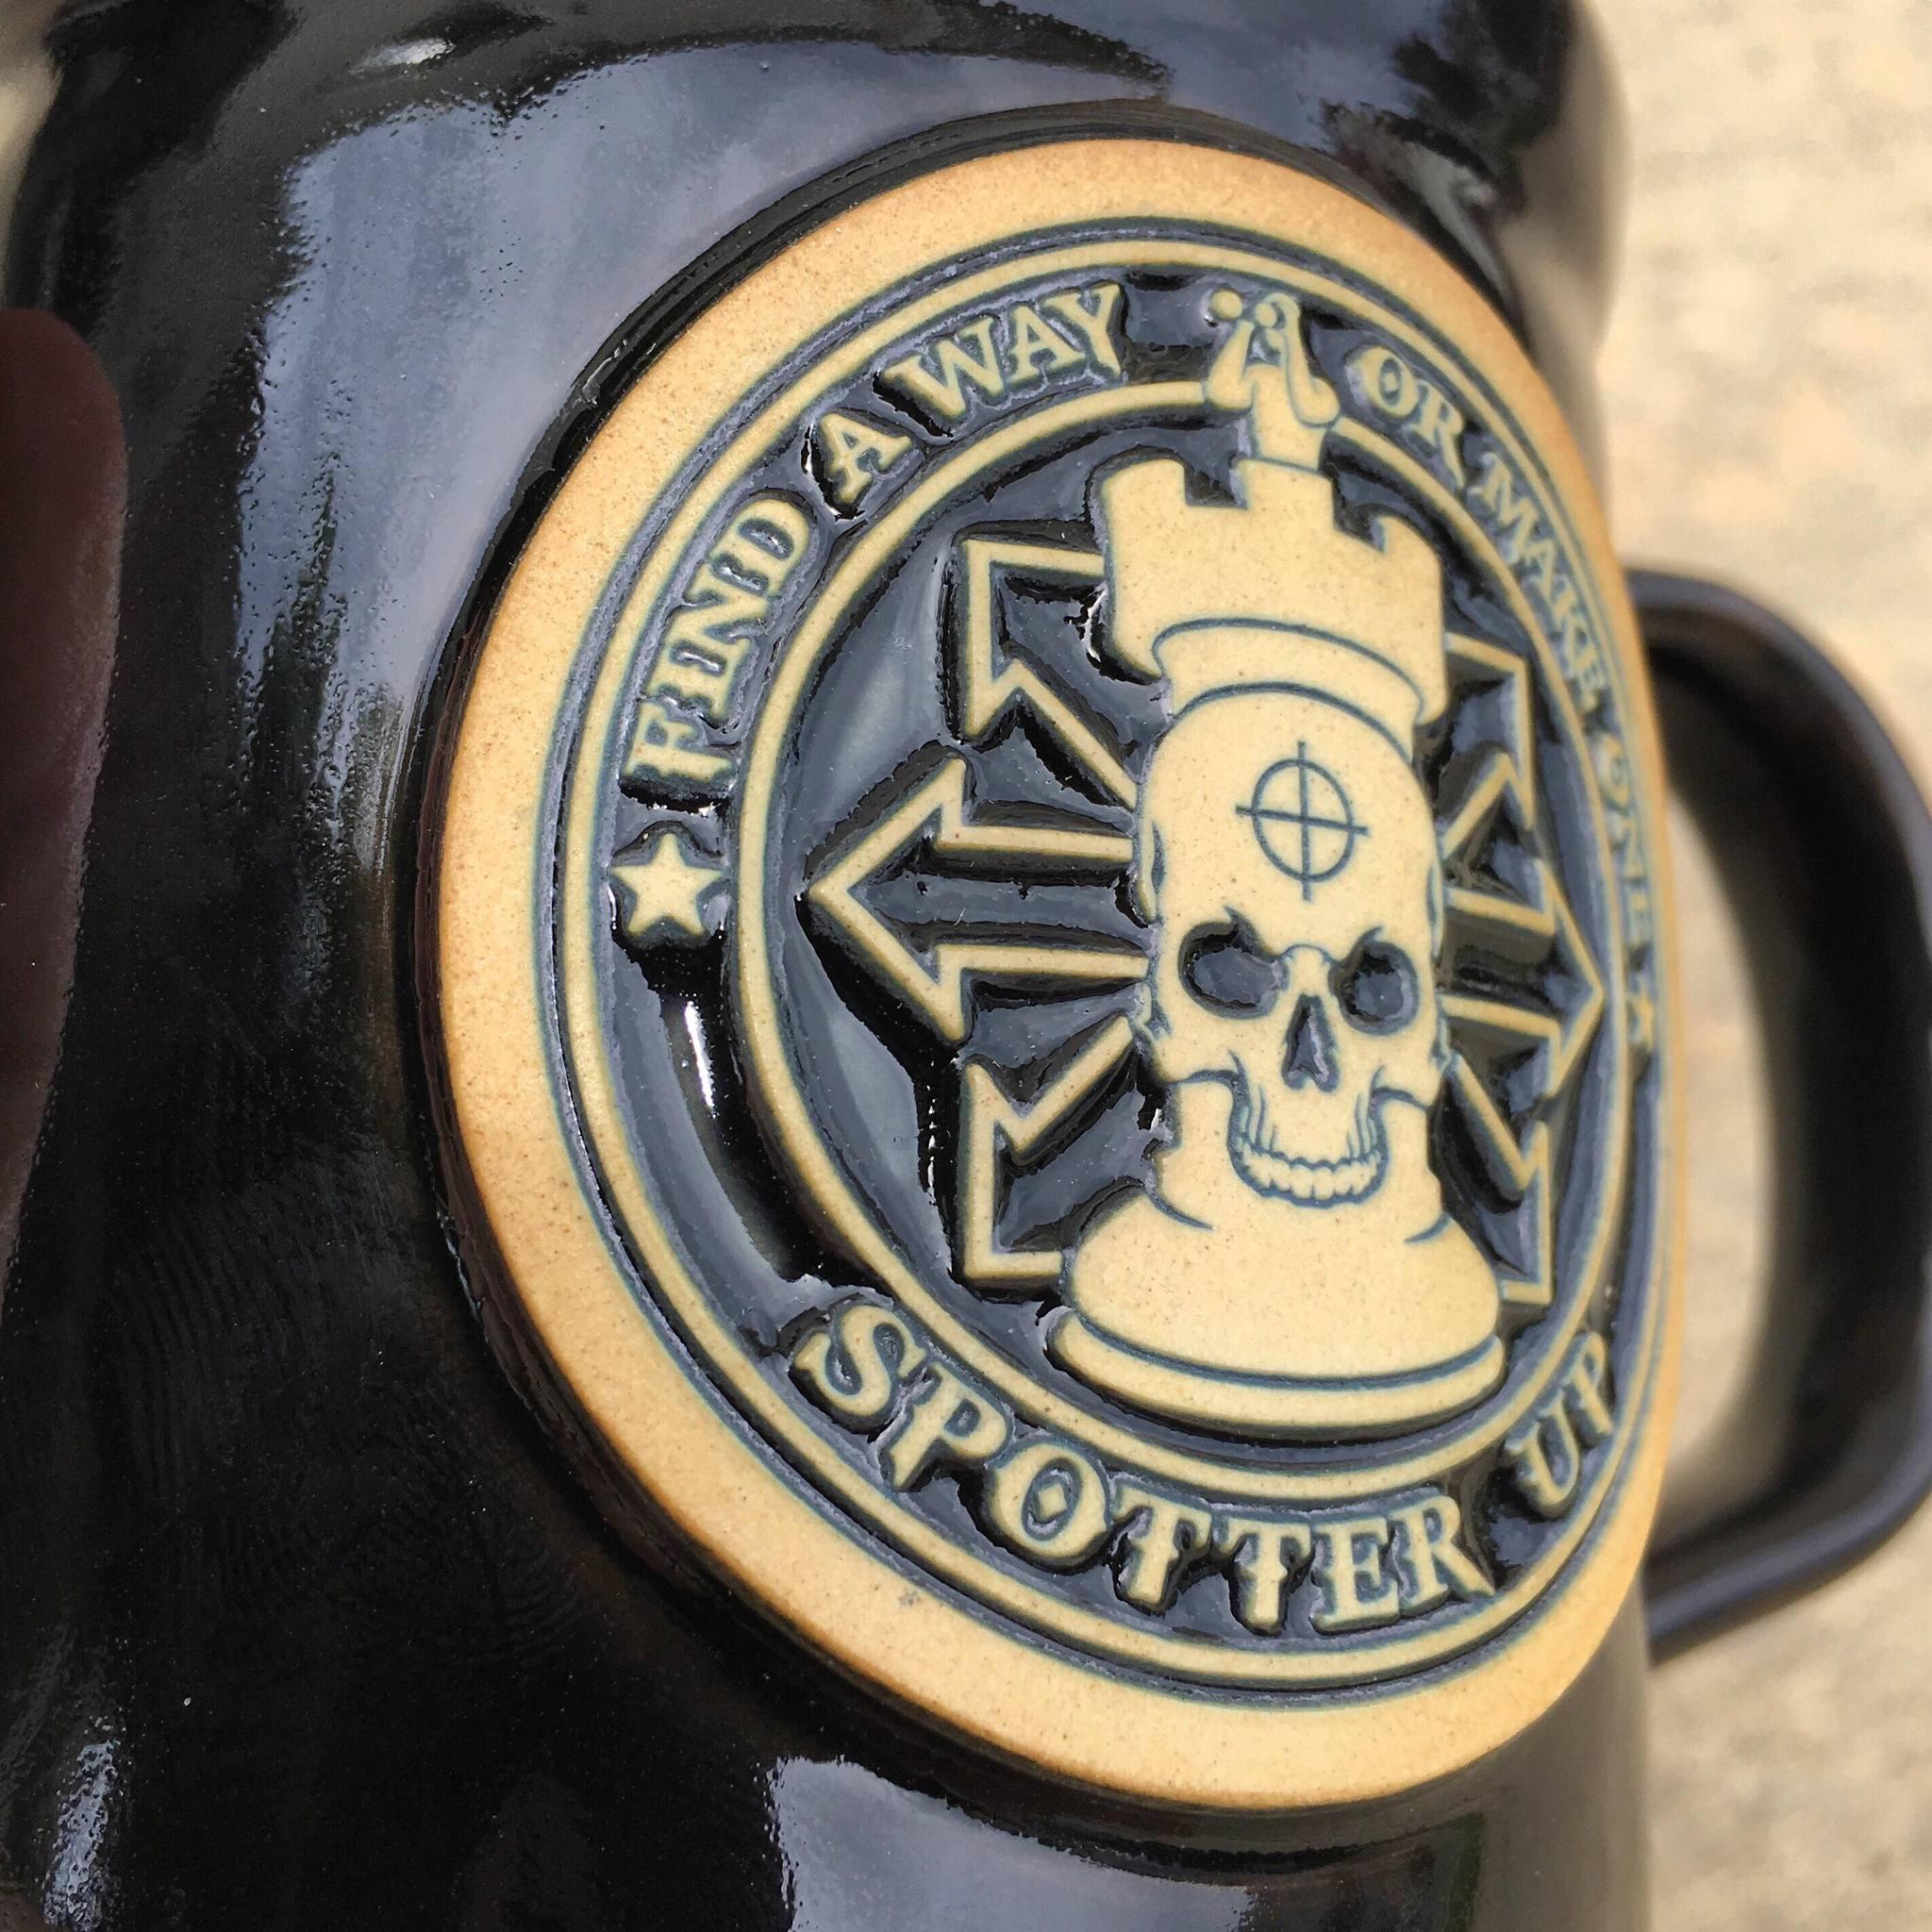 coffee_mugs_spotterup_3_1024x1024@2x.jpg